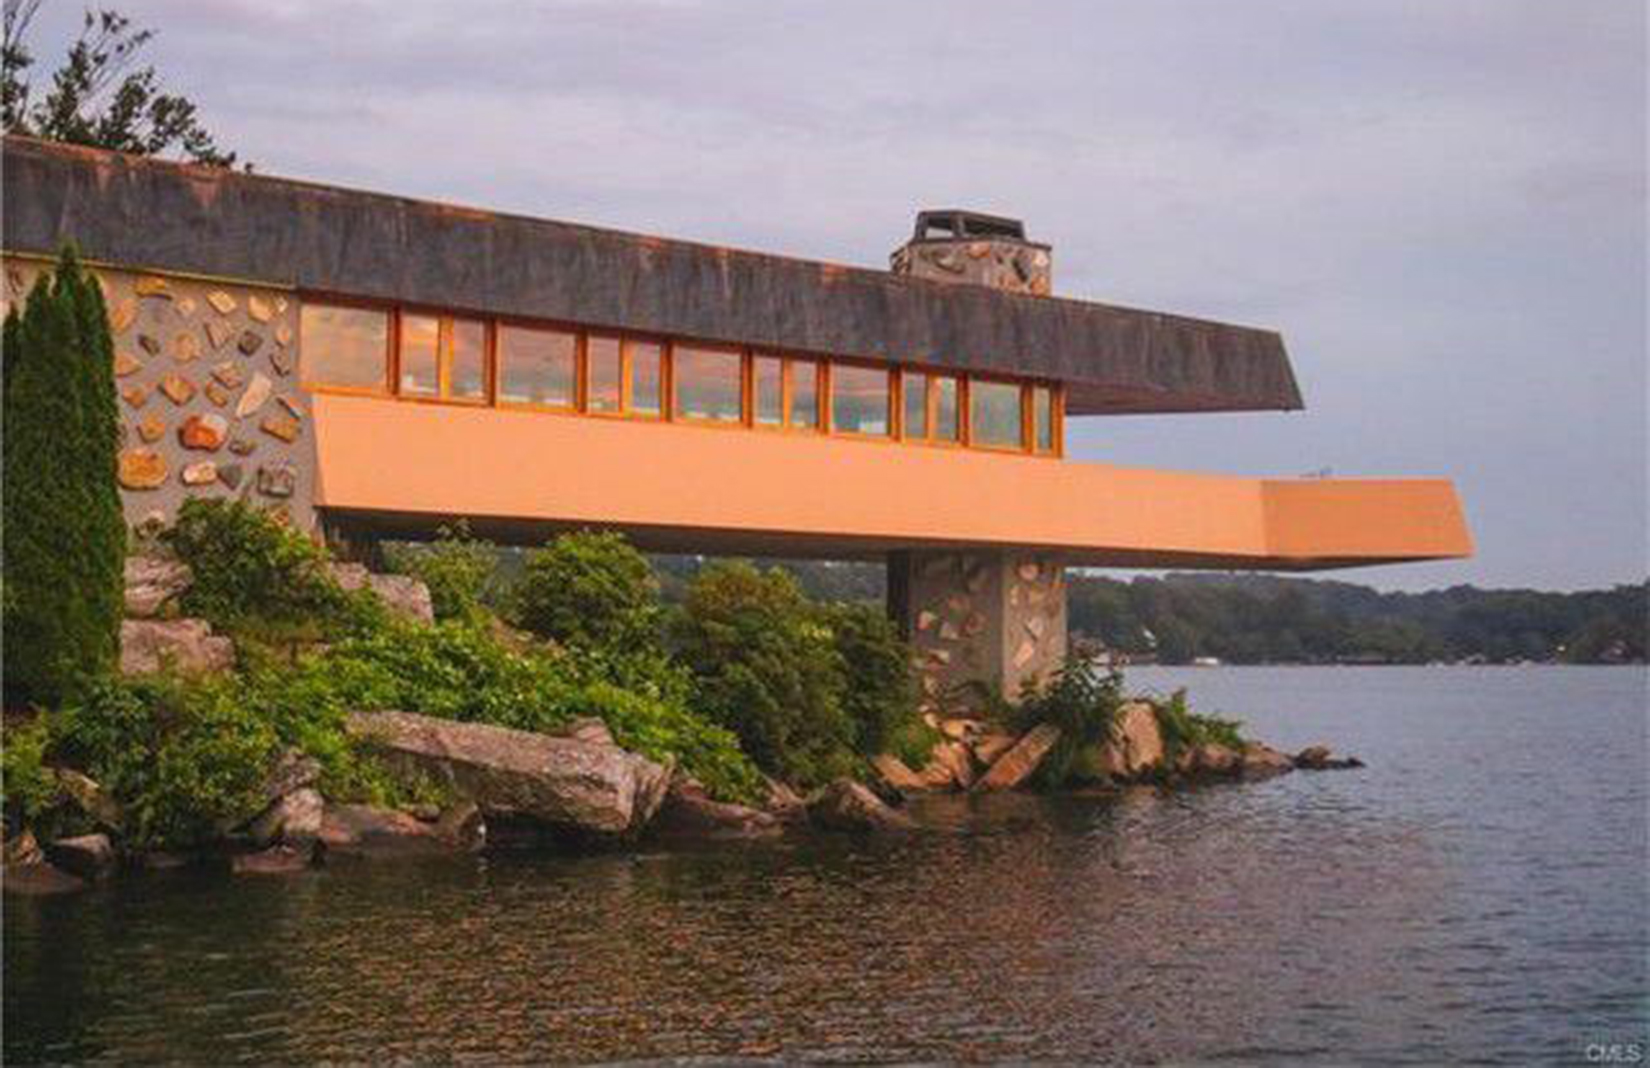 Petre Island, featuring 2 Frank Lloyd Wright homes